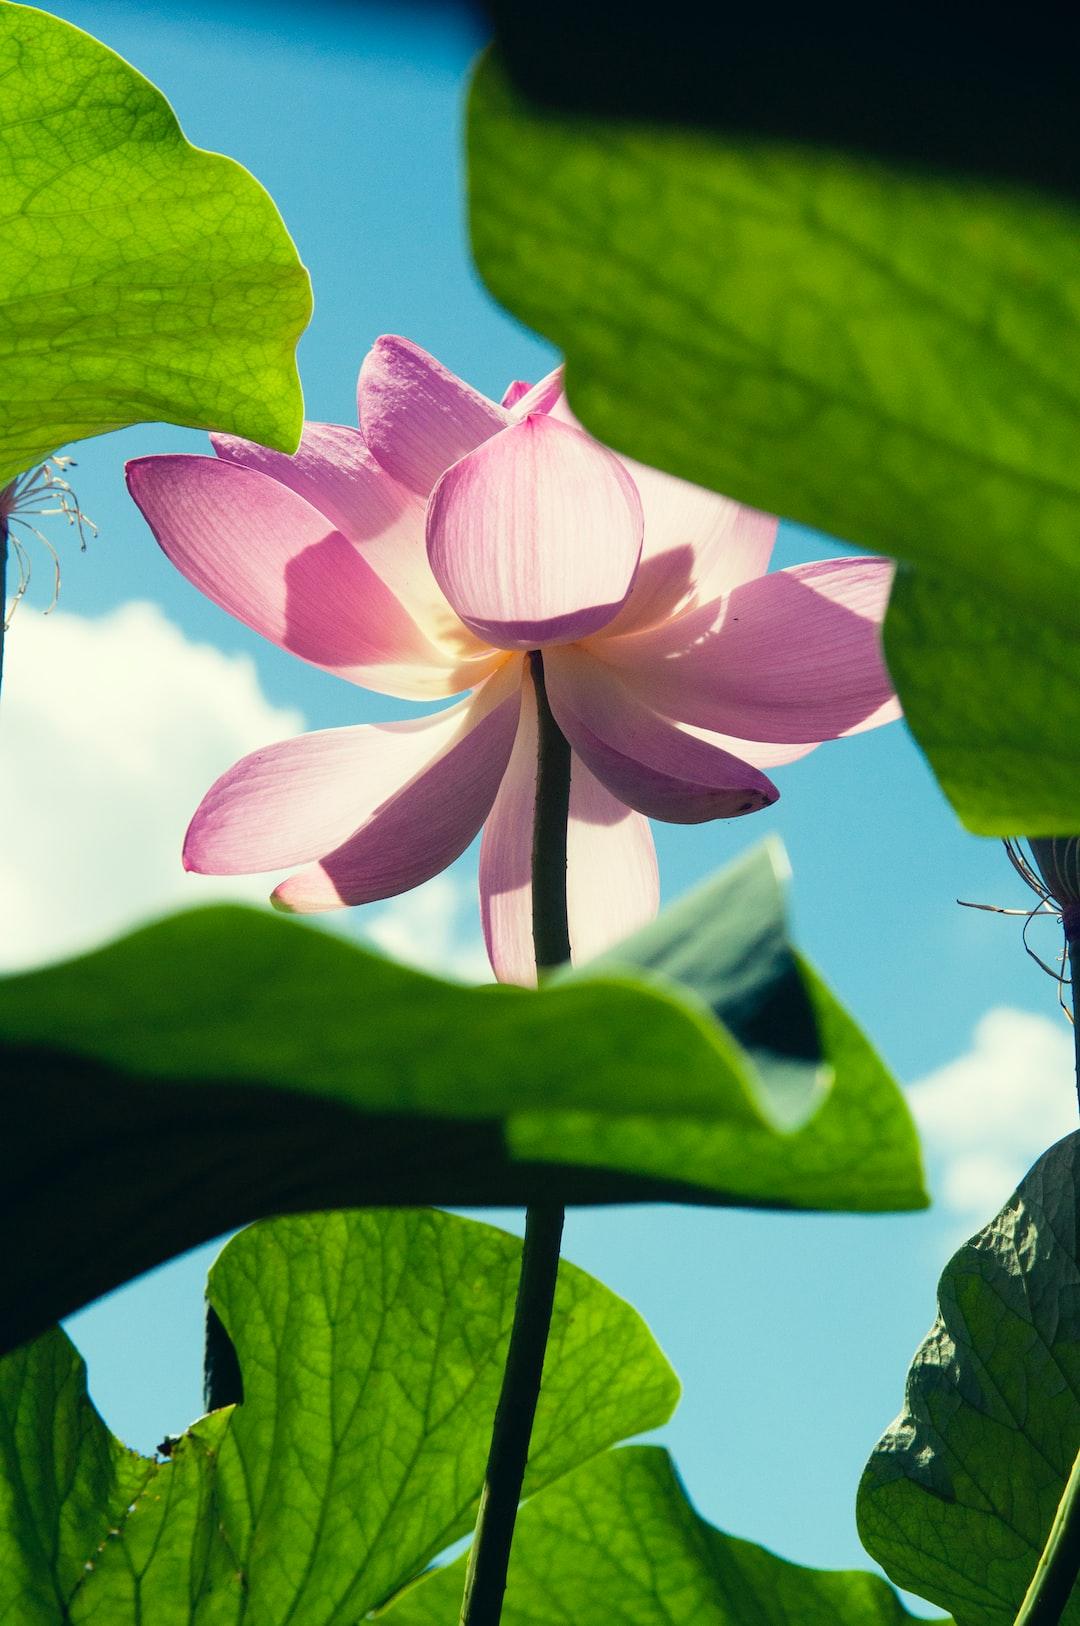 27 Lotus Pictures Download Free Images On Unsplash